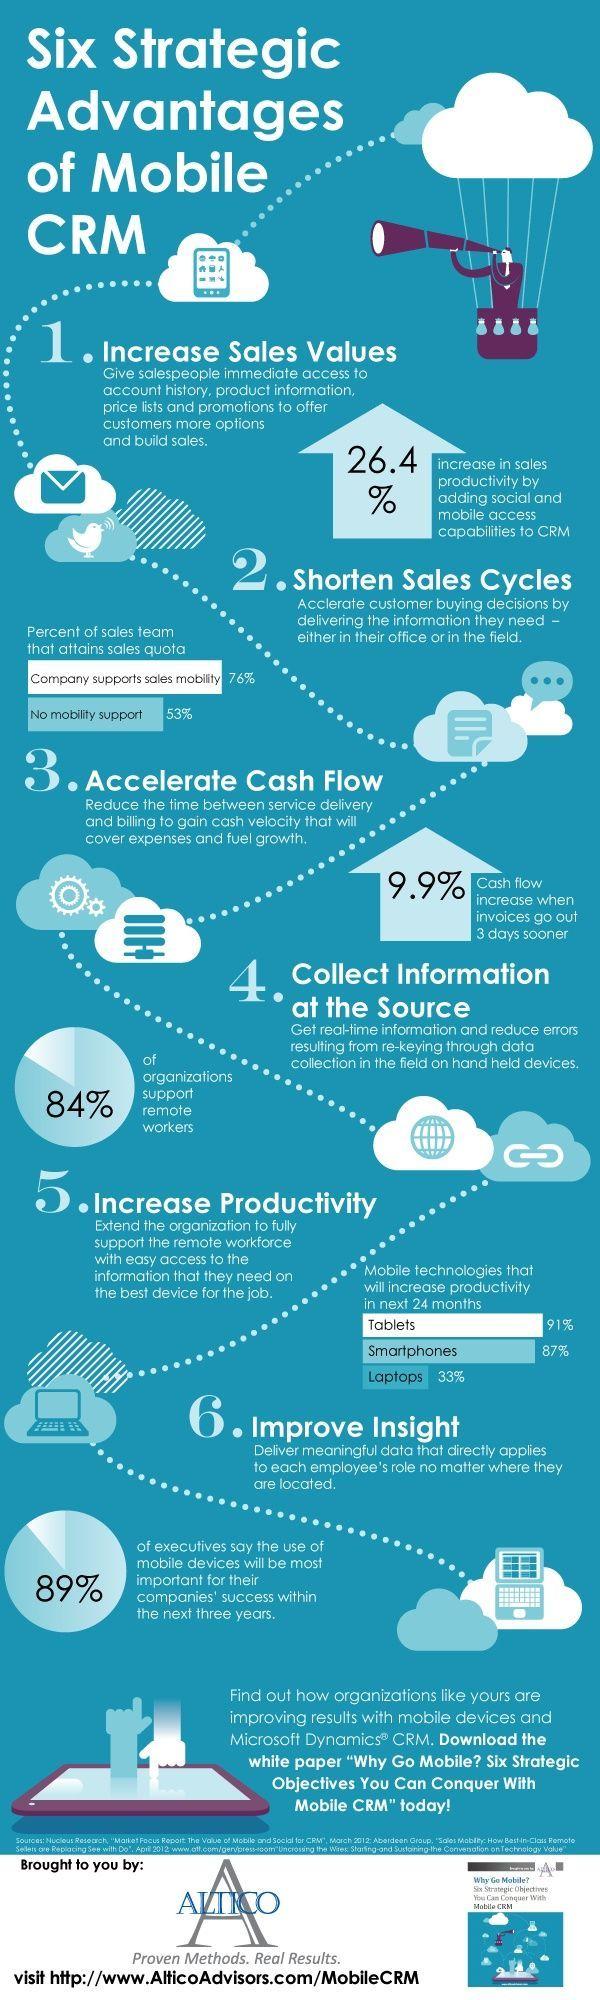 Six Strategic Advantages of Having a Mobile CRM @lauramata1  #infographic #mobile #crm   auramata1/